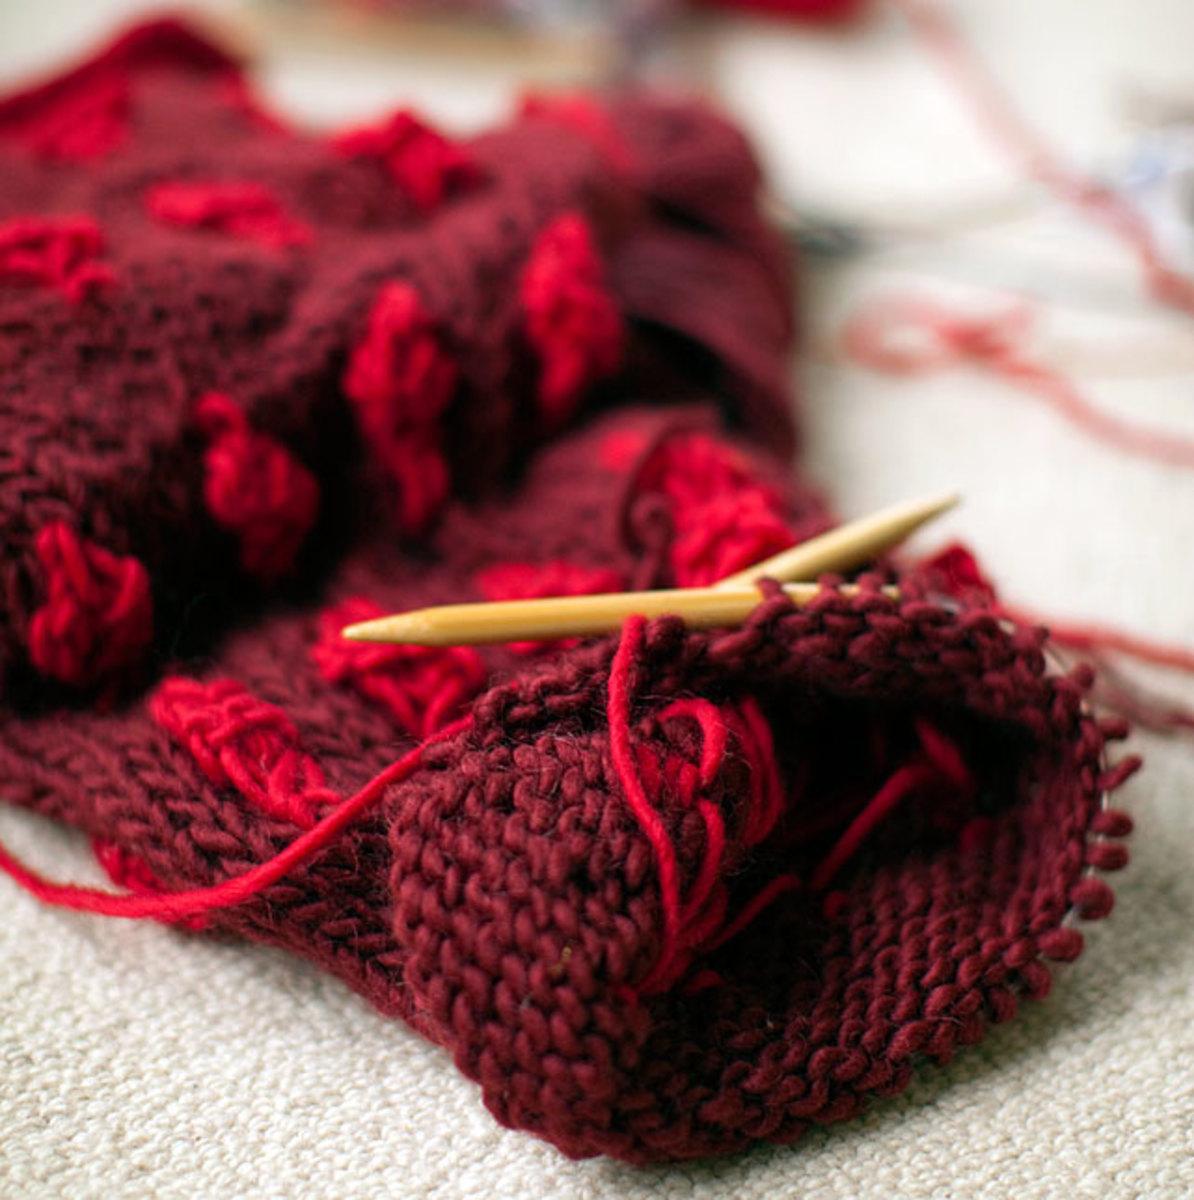 131030095922-knitted-scarf-single-image-cut.jpg